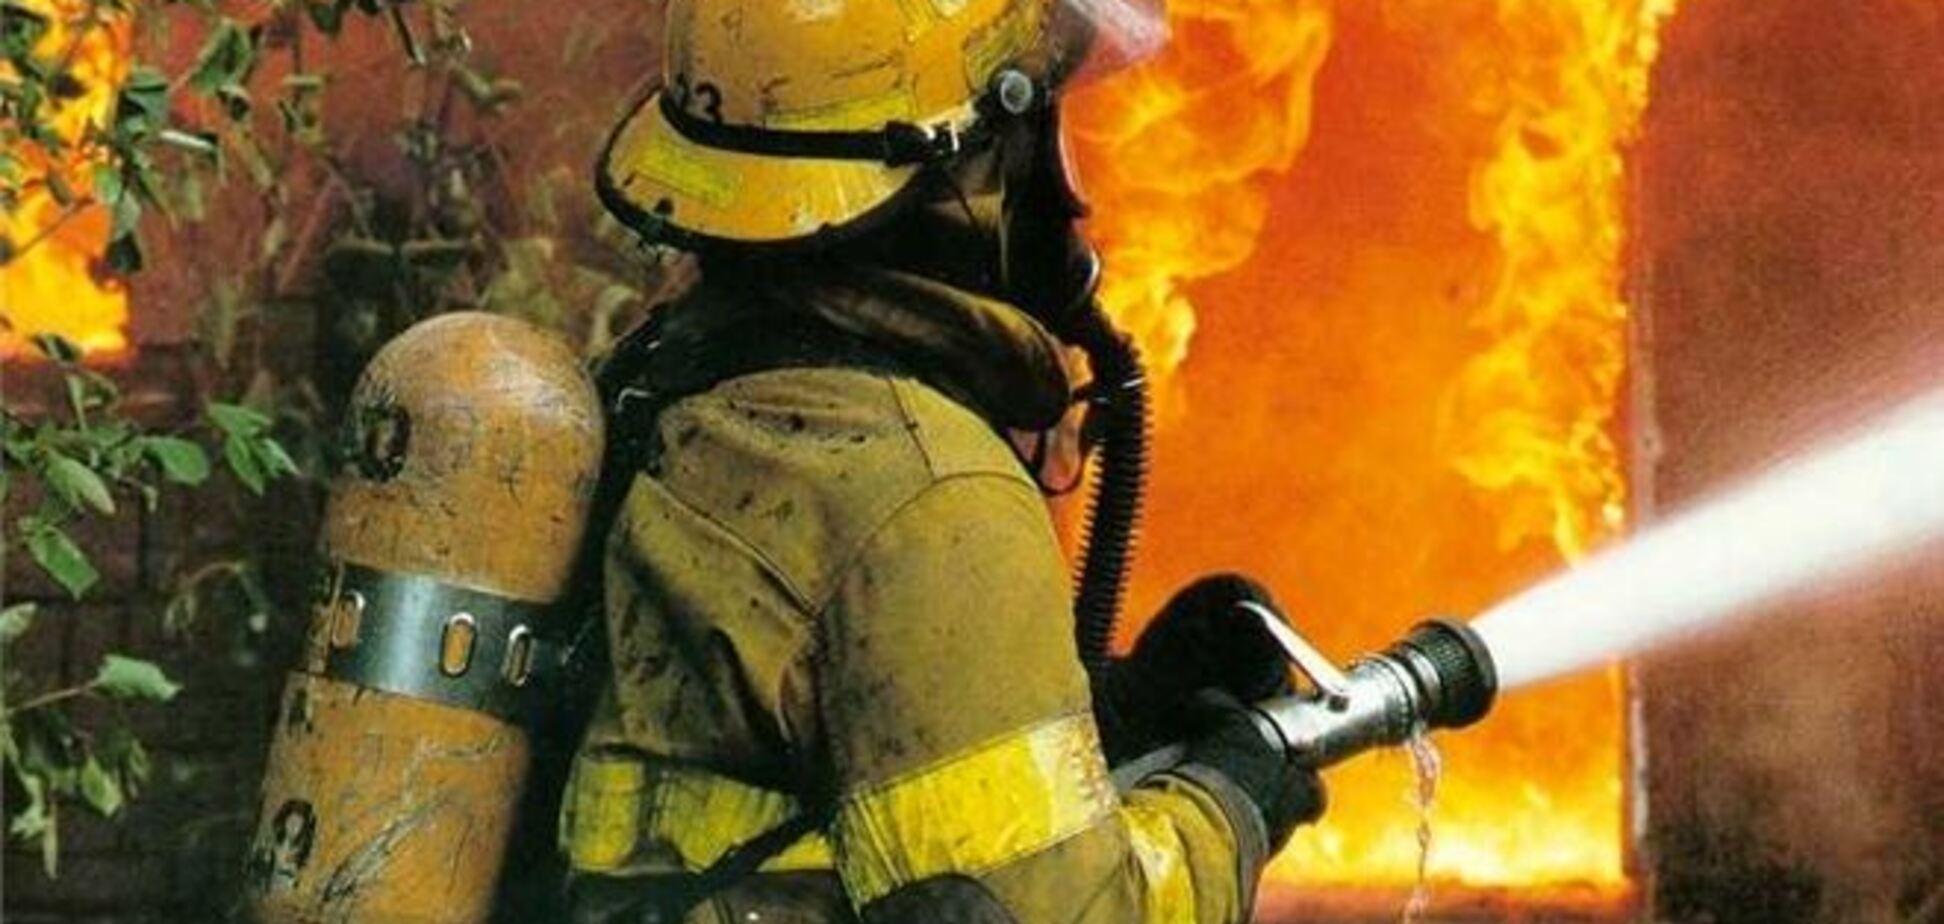 У Севастополі вже 4:00 горить гуртожиток: двоє загиблих